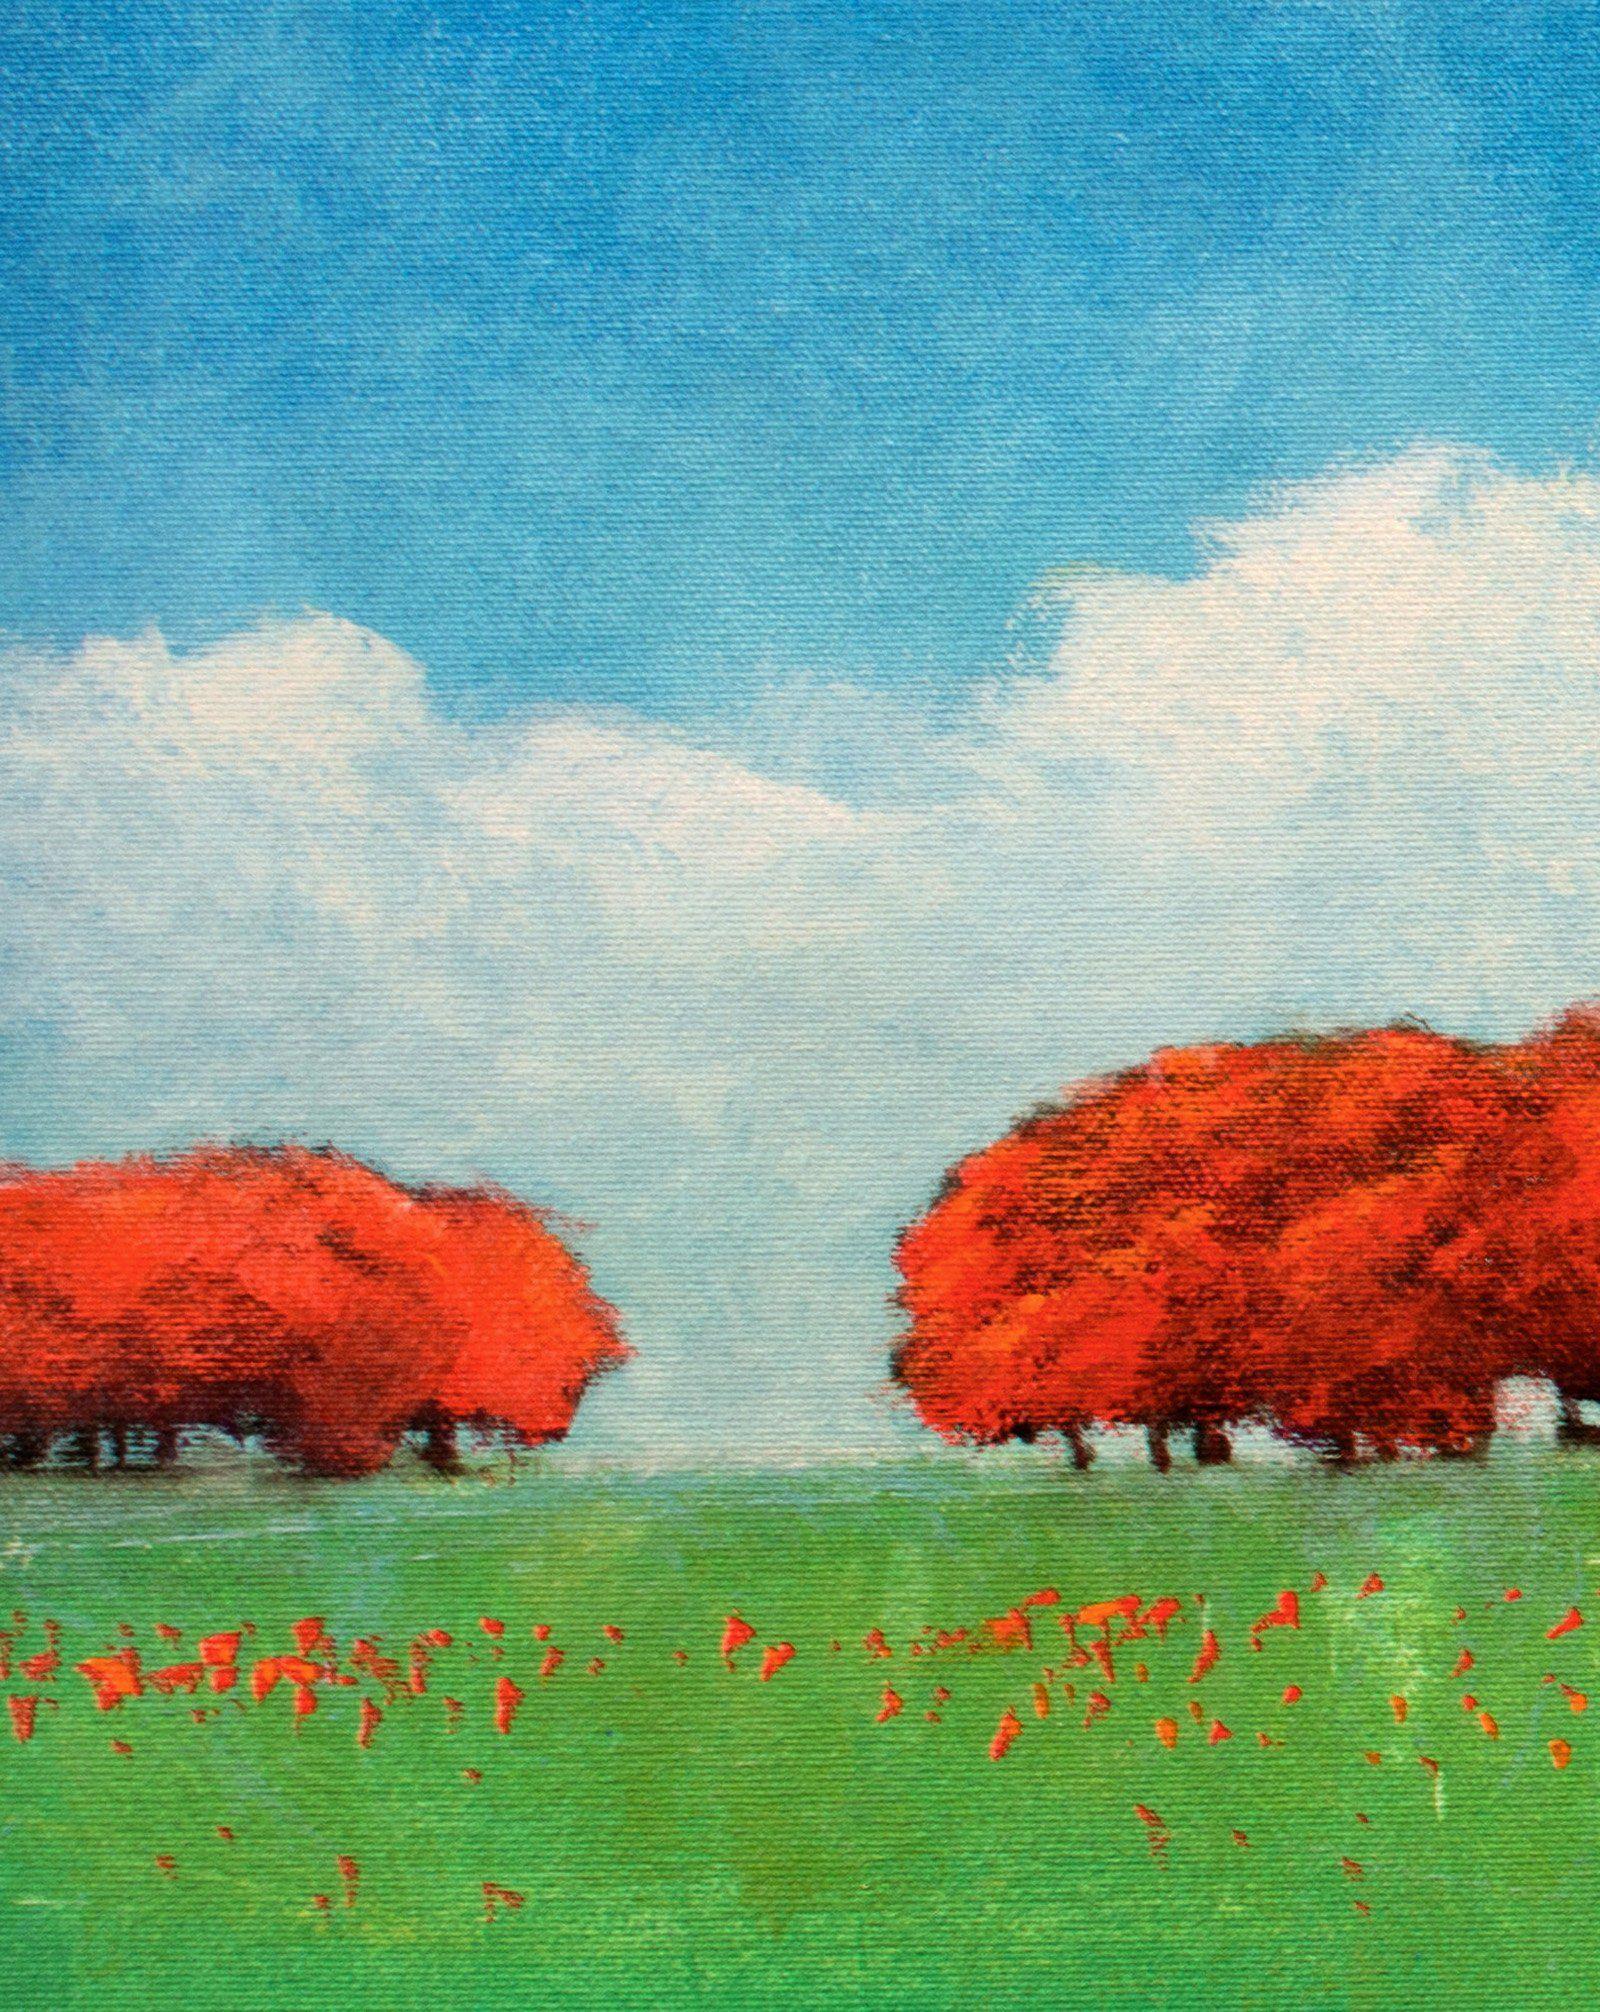 Red Tree Painting Original Landscape Painting Contemporary Monet Style Original Blue Sky Sunset Landscape Painting Original Landscape Painting Tree Painting